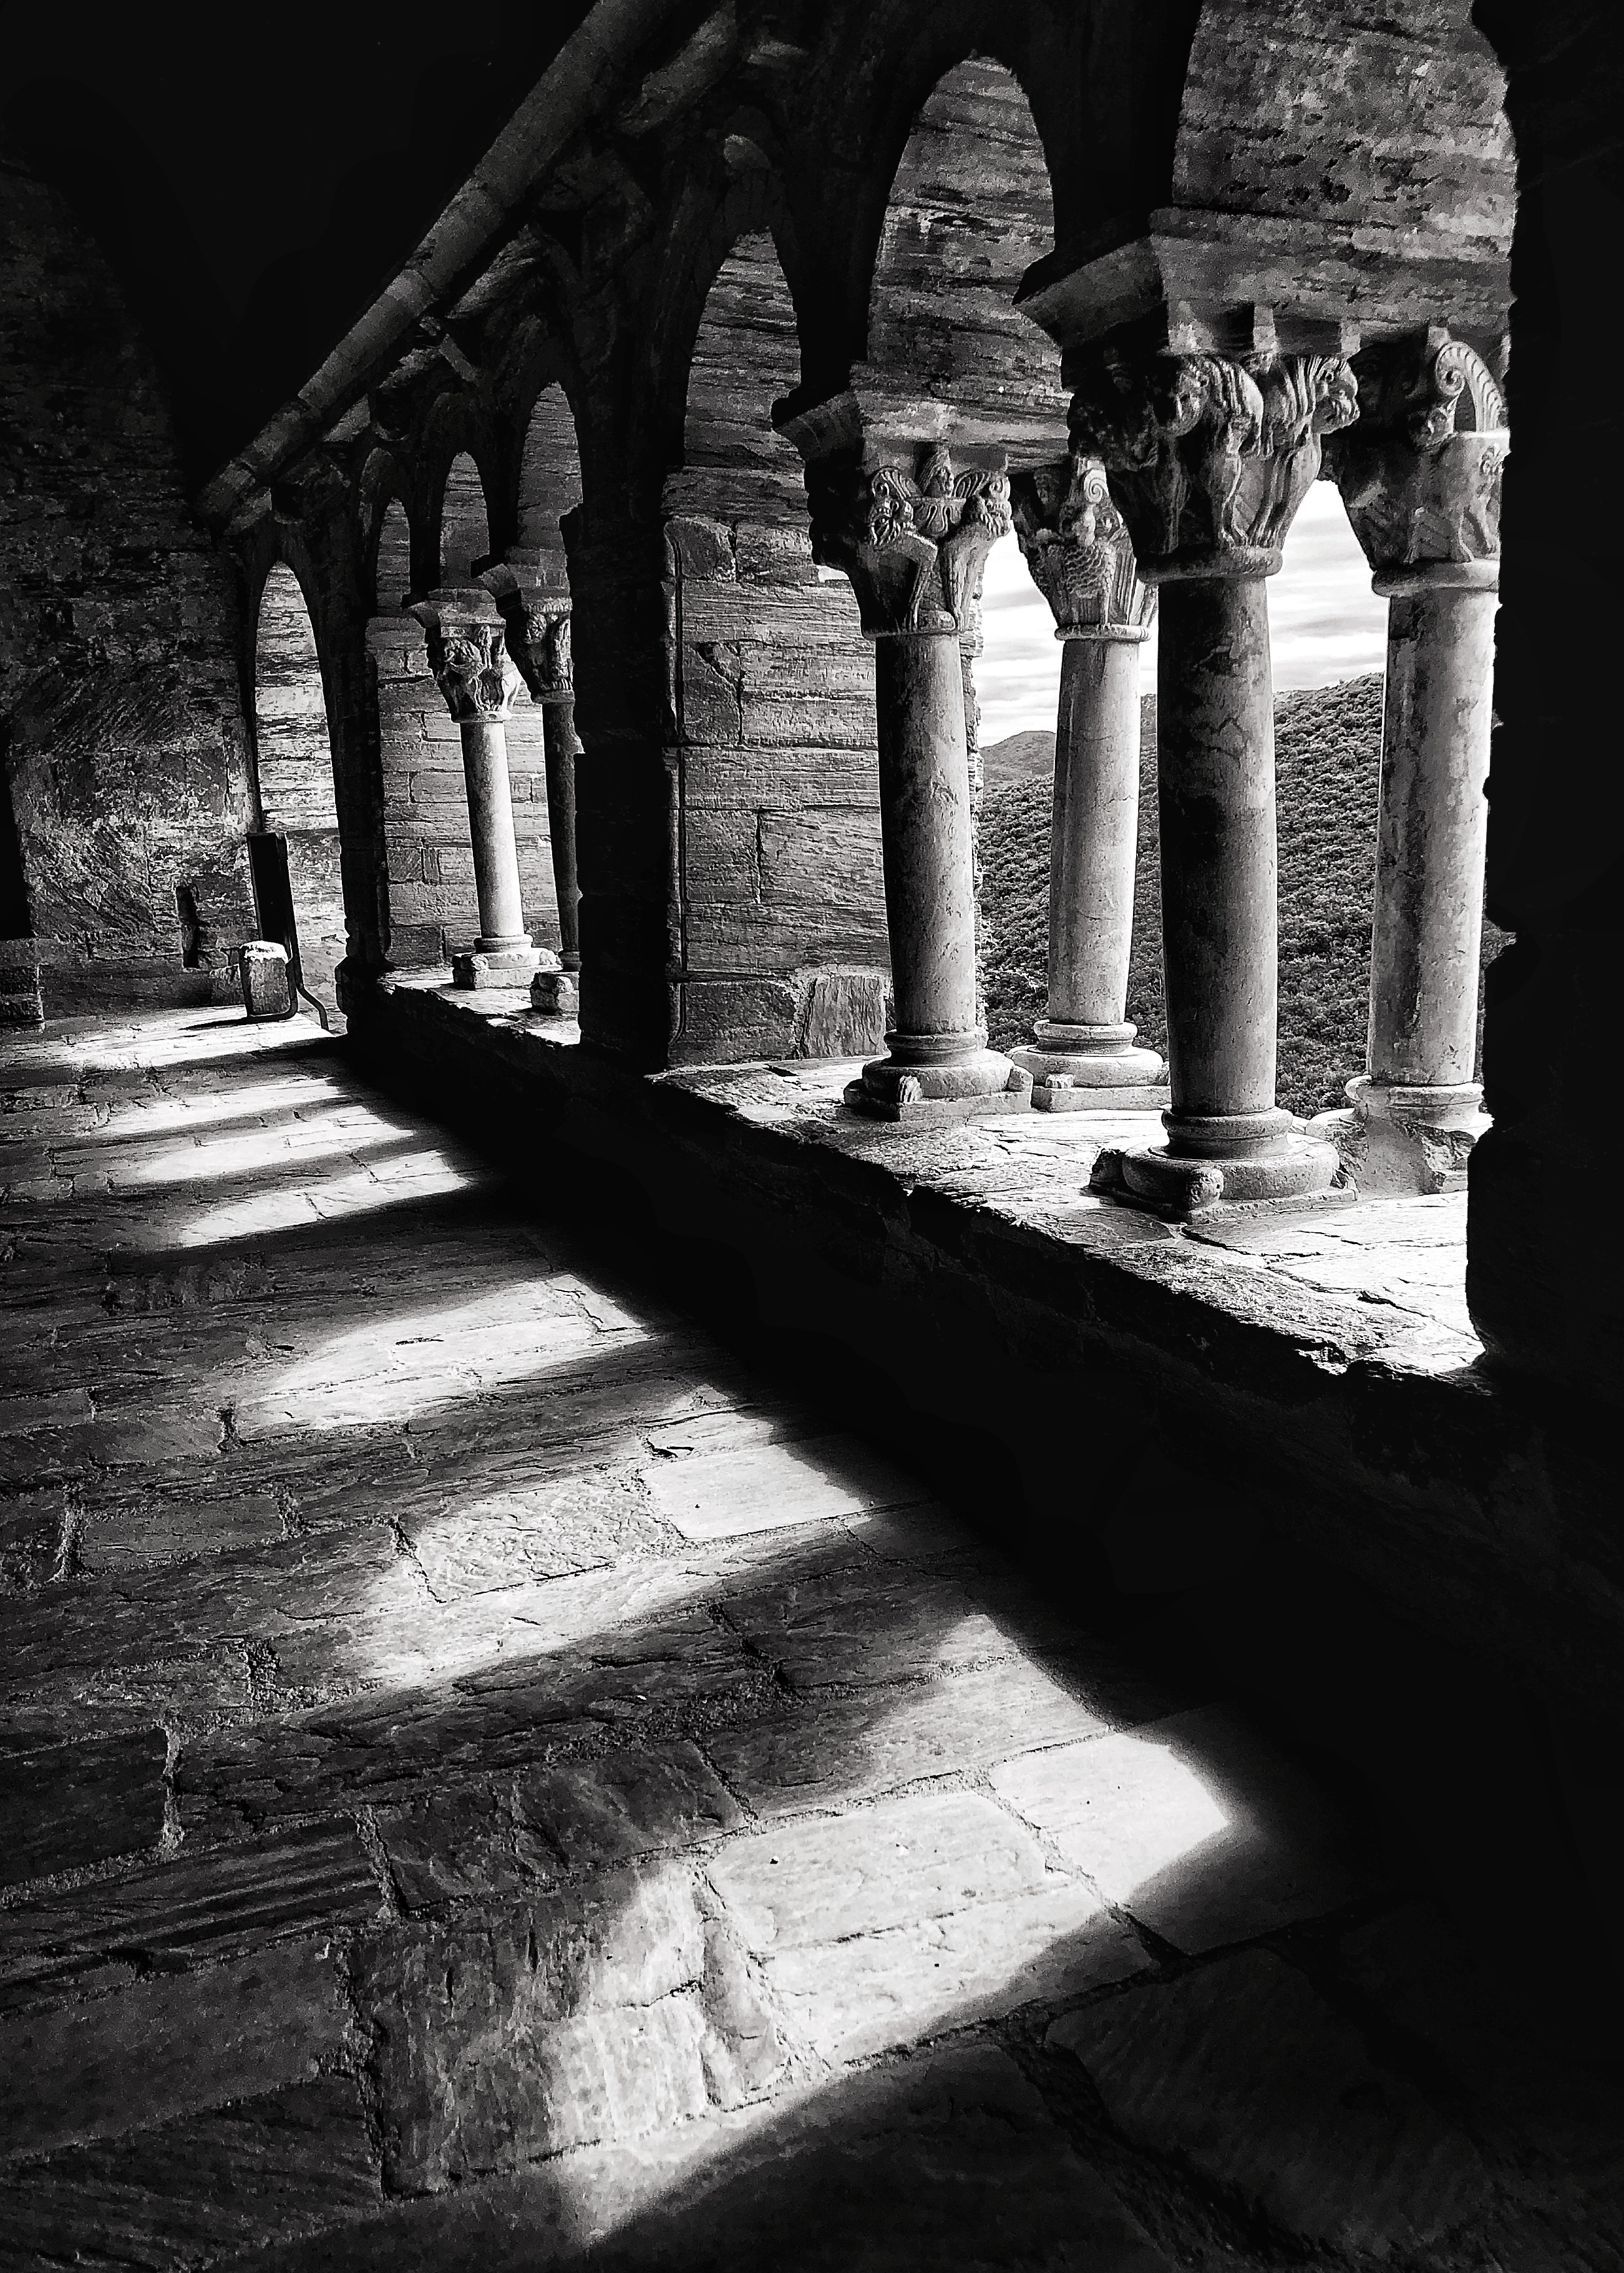 the cloister of Serrabone